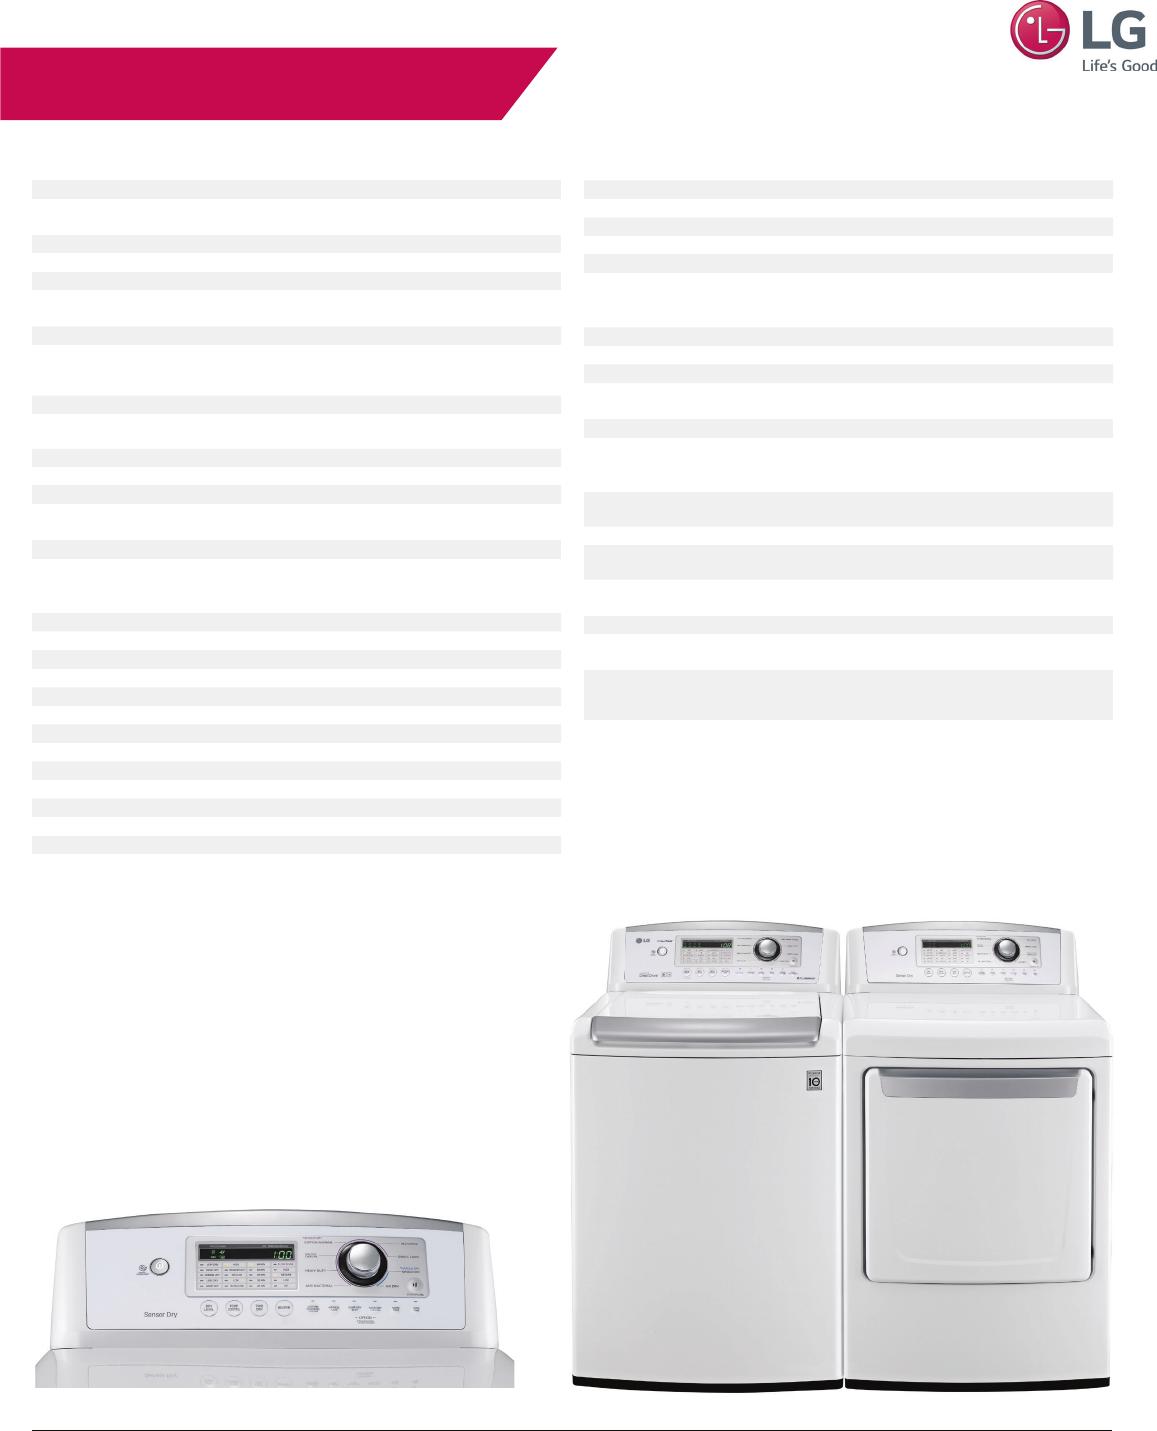 LG DLE4970WE User Manual Specification DLG4971WE Spec Sheet